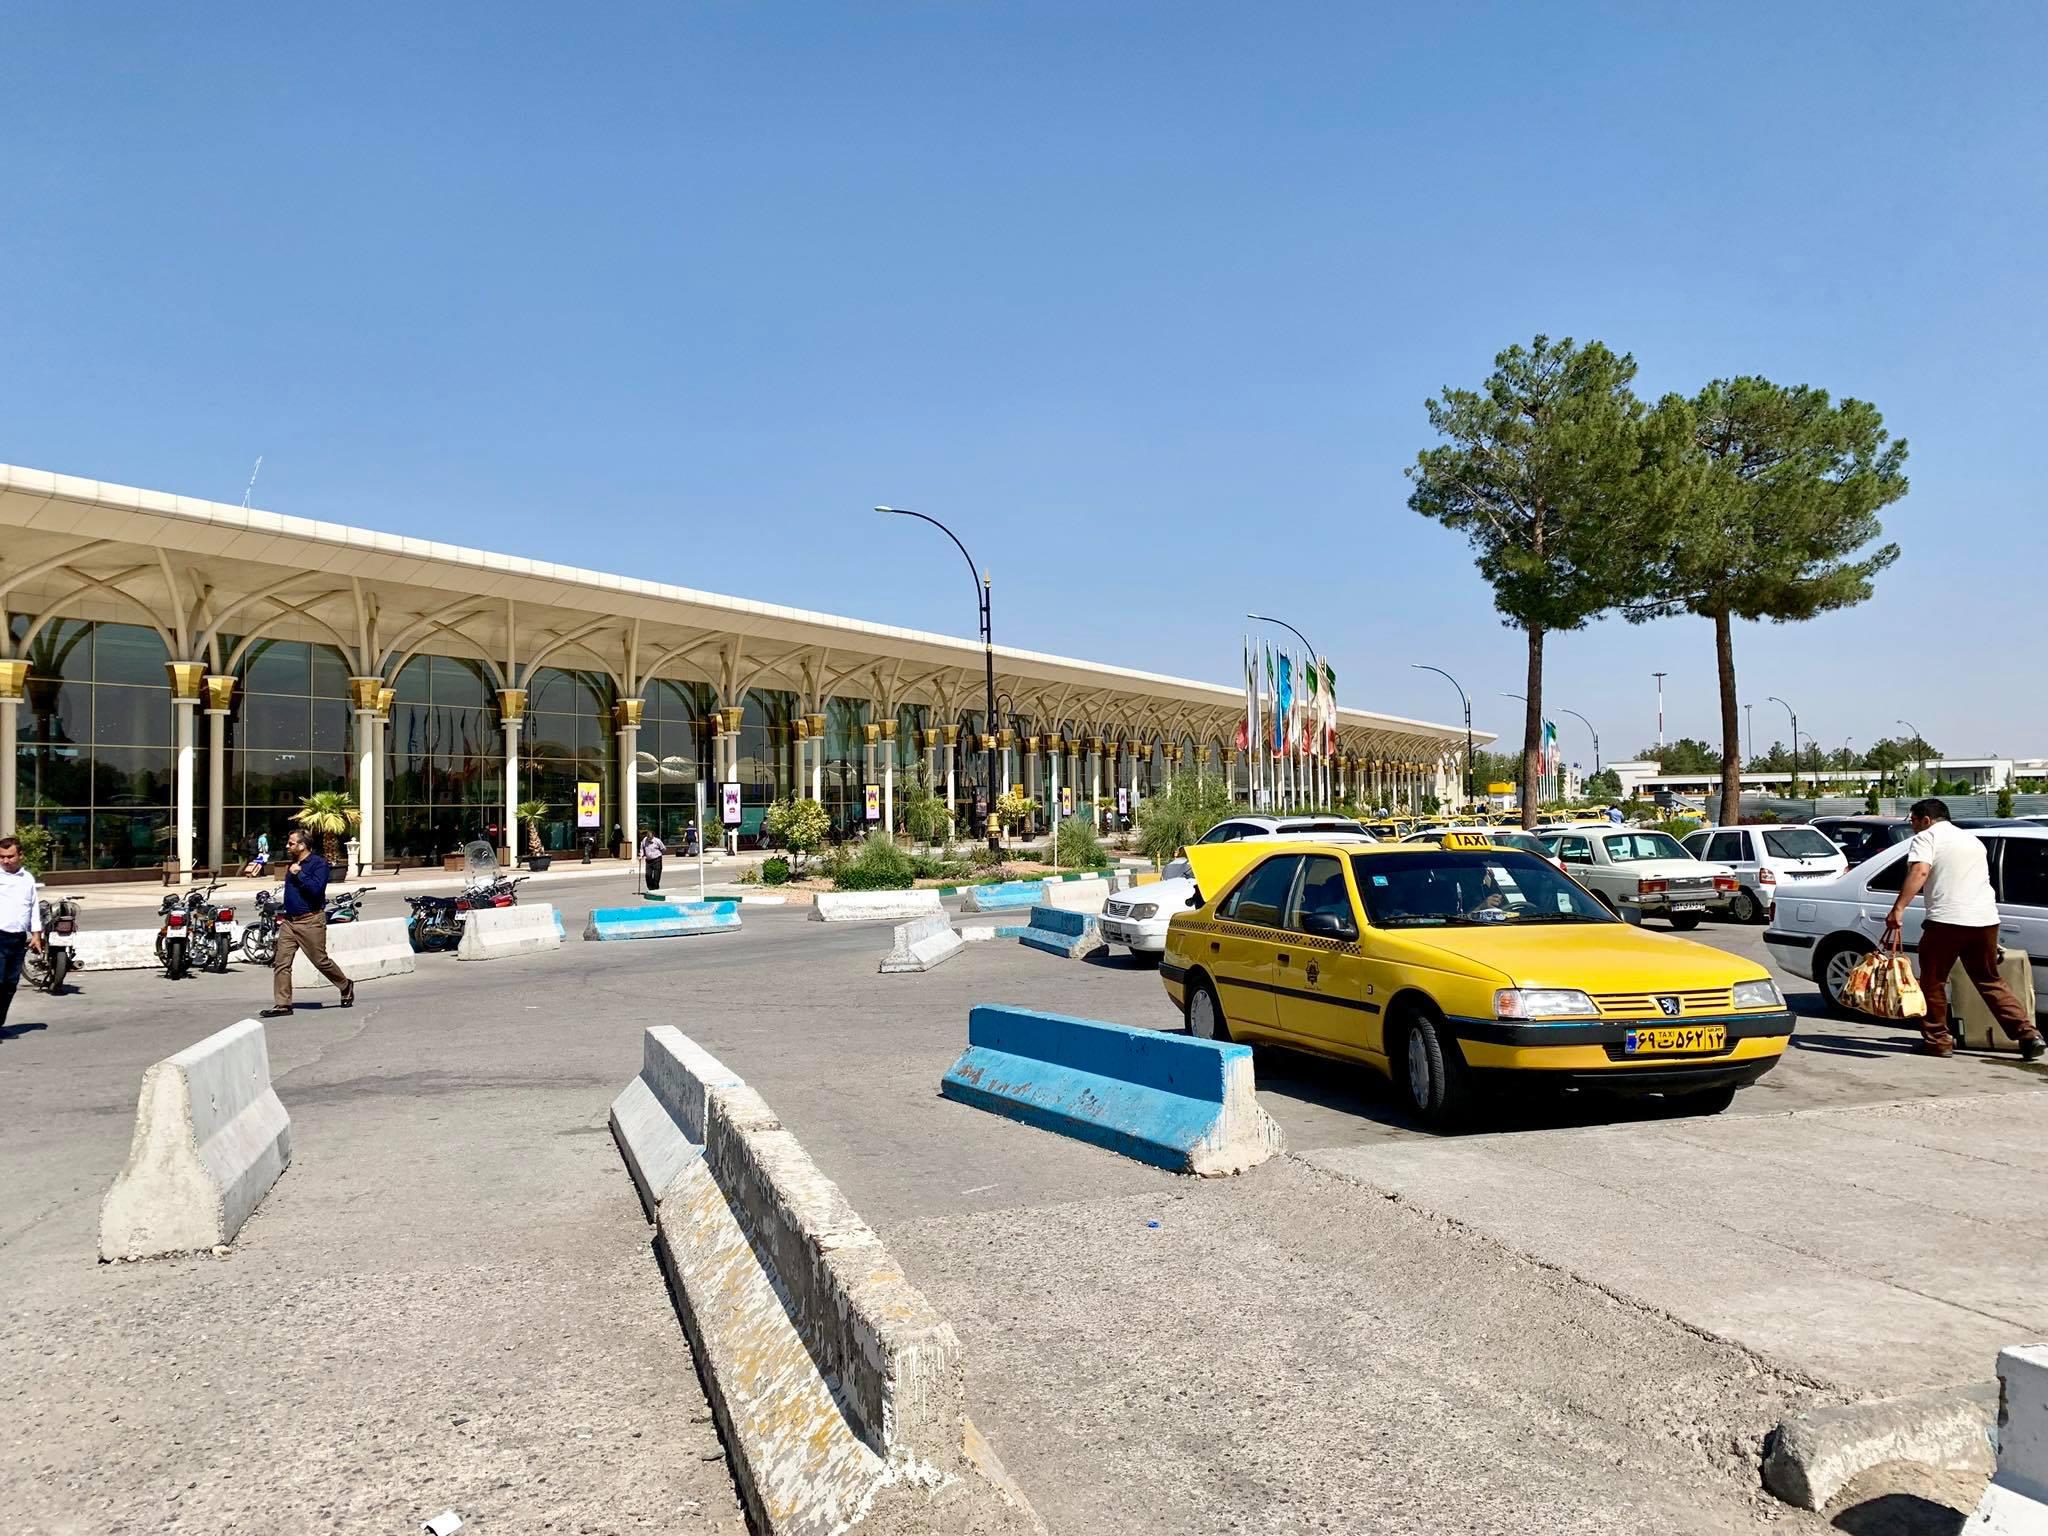 Kach Solo Travels in 2019 Mashhad to Shiraz6.jpg